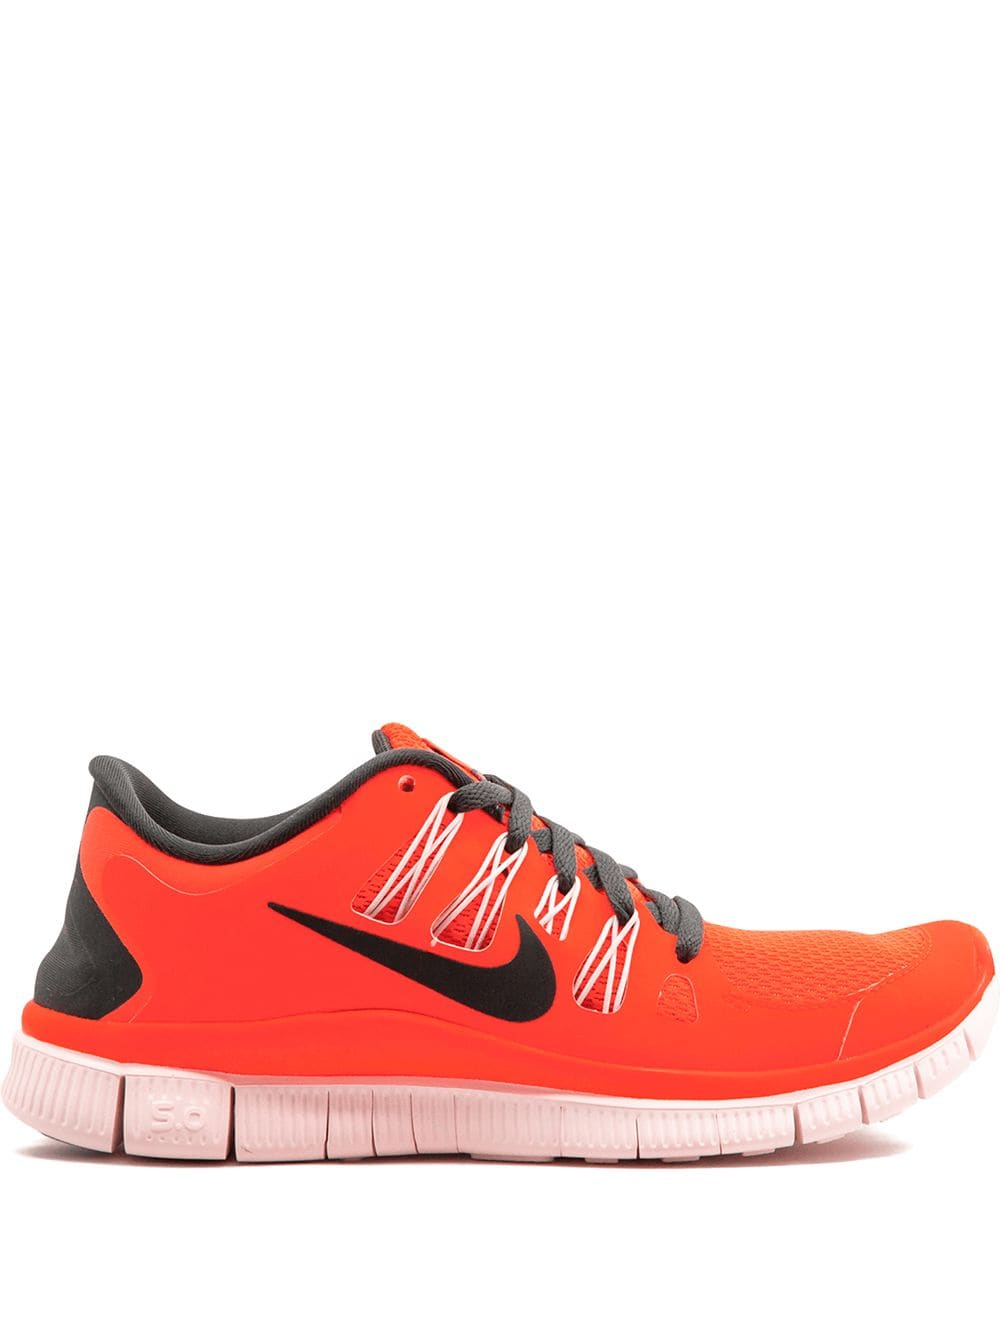 Nike Free 5.0+ Sneaker Herren Schwarz, Rot online kaufen